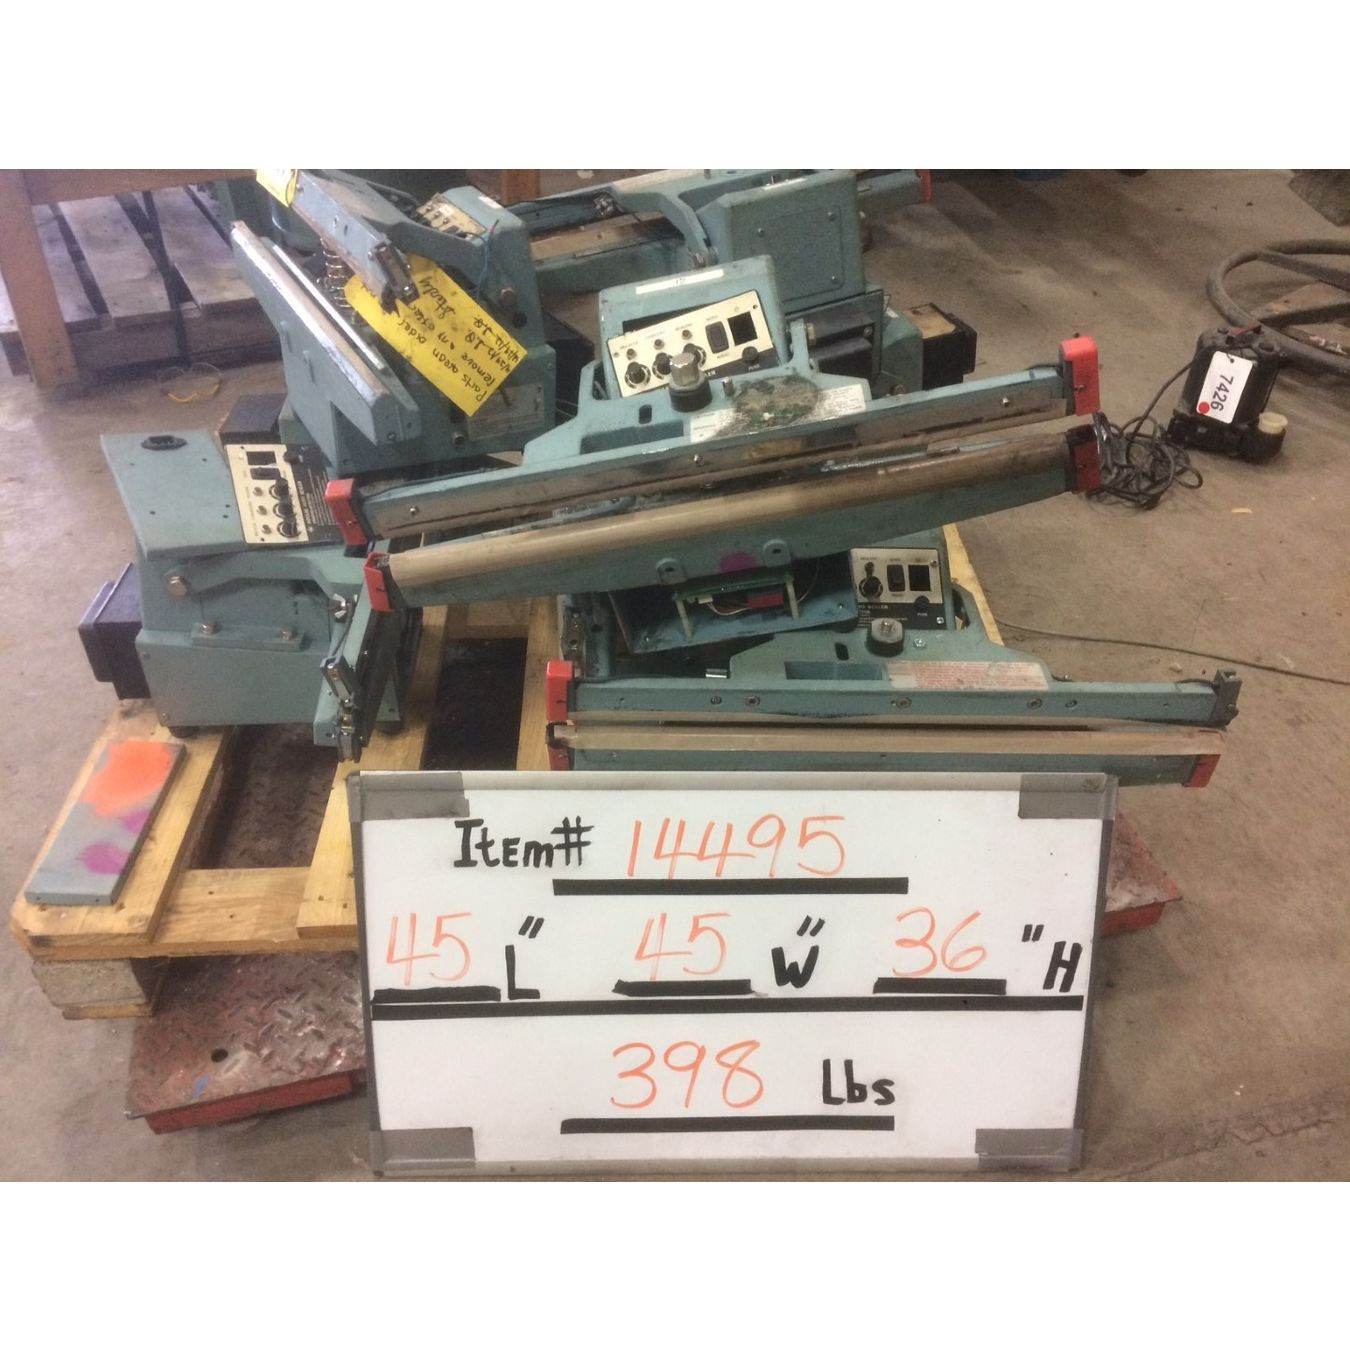 Used Impulse Foot Heat Sealers (PARTS) - Model AIE-610FDA